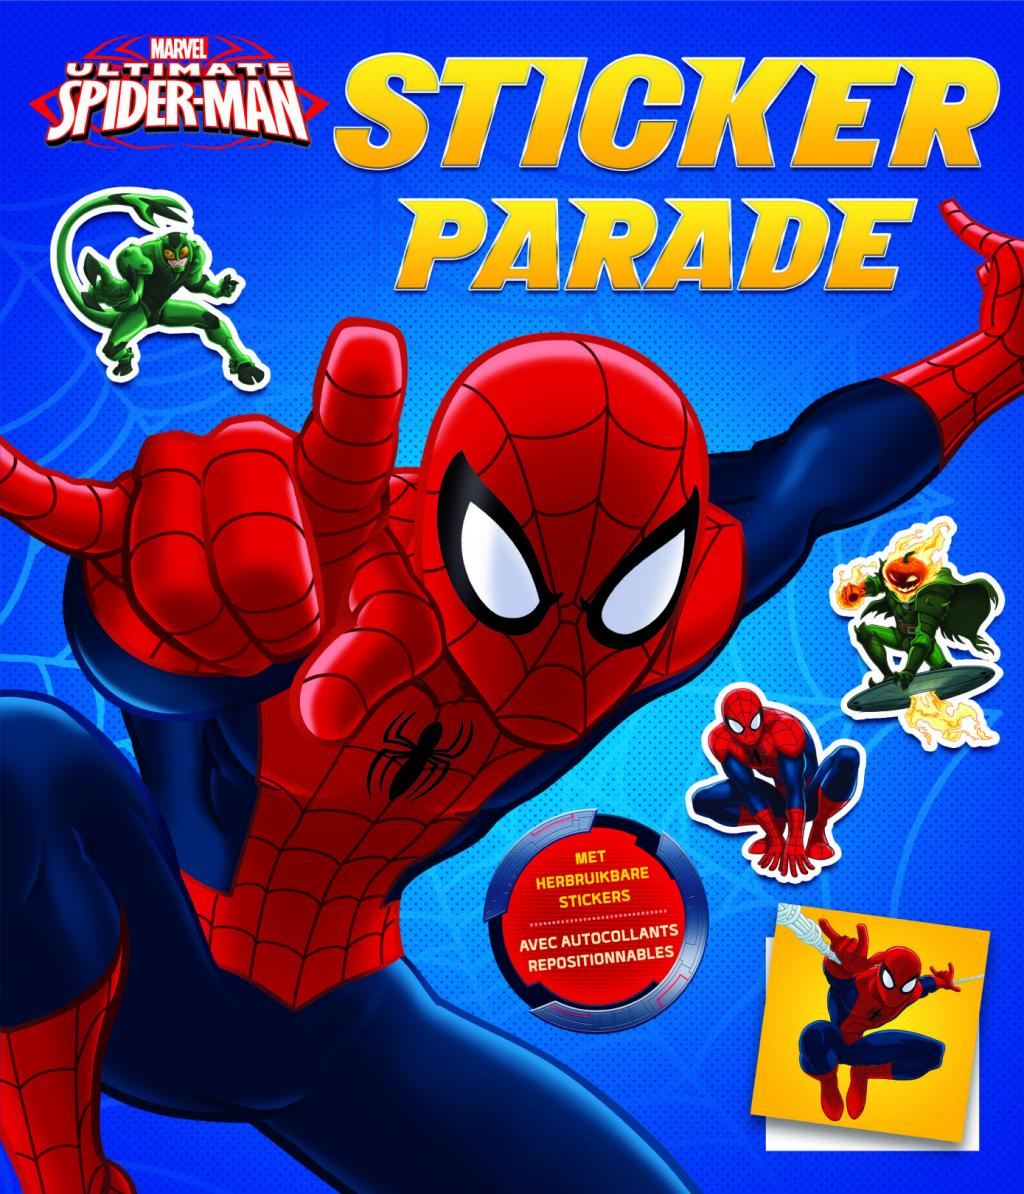 Ultime Spider-Man - Sticker Parade